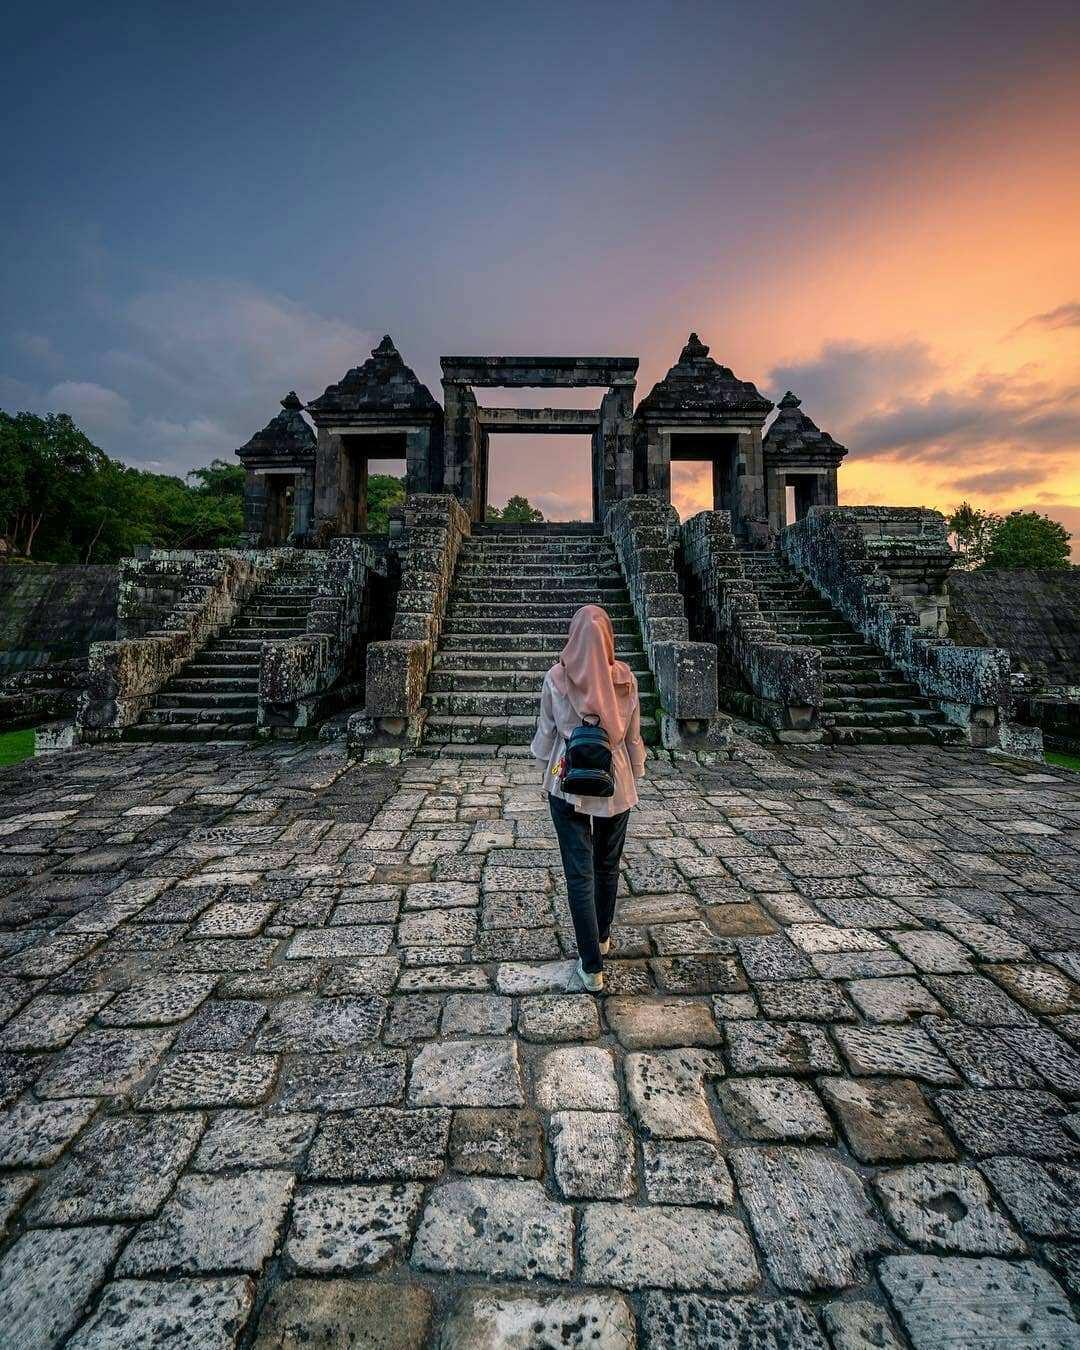 Sunset Ratu Boko Jogja, Image From @syahdiea